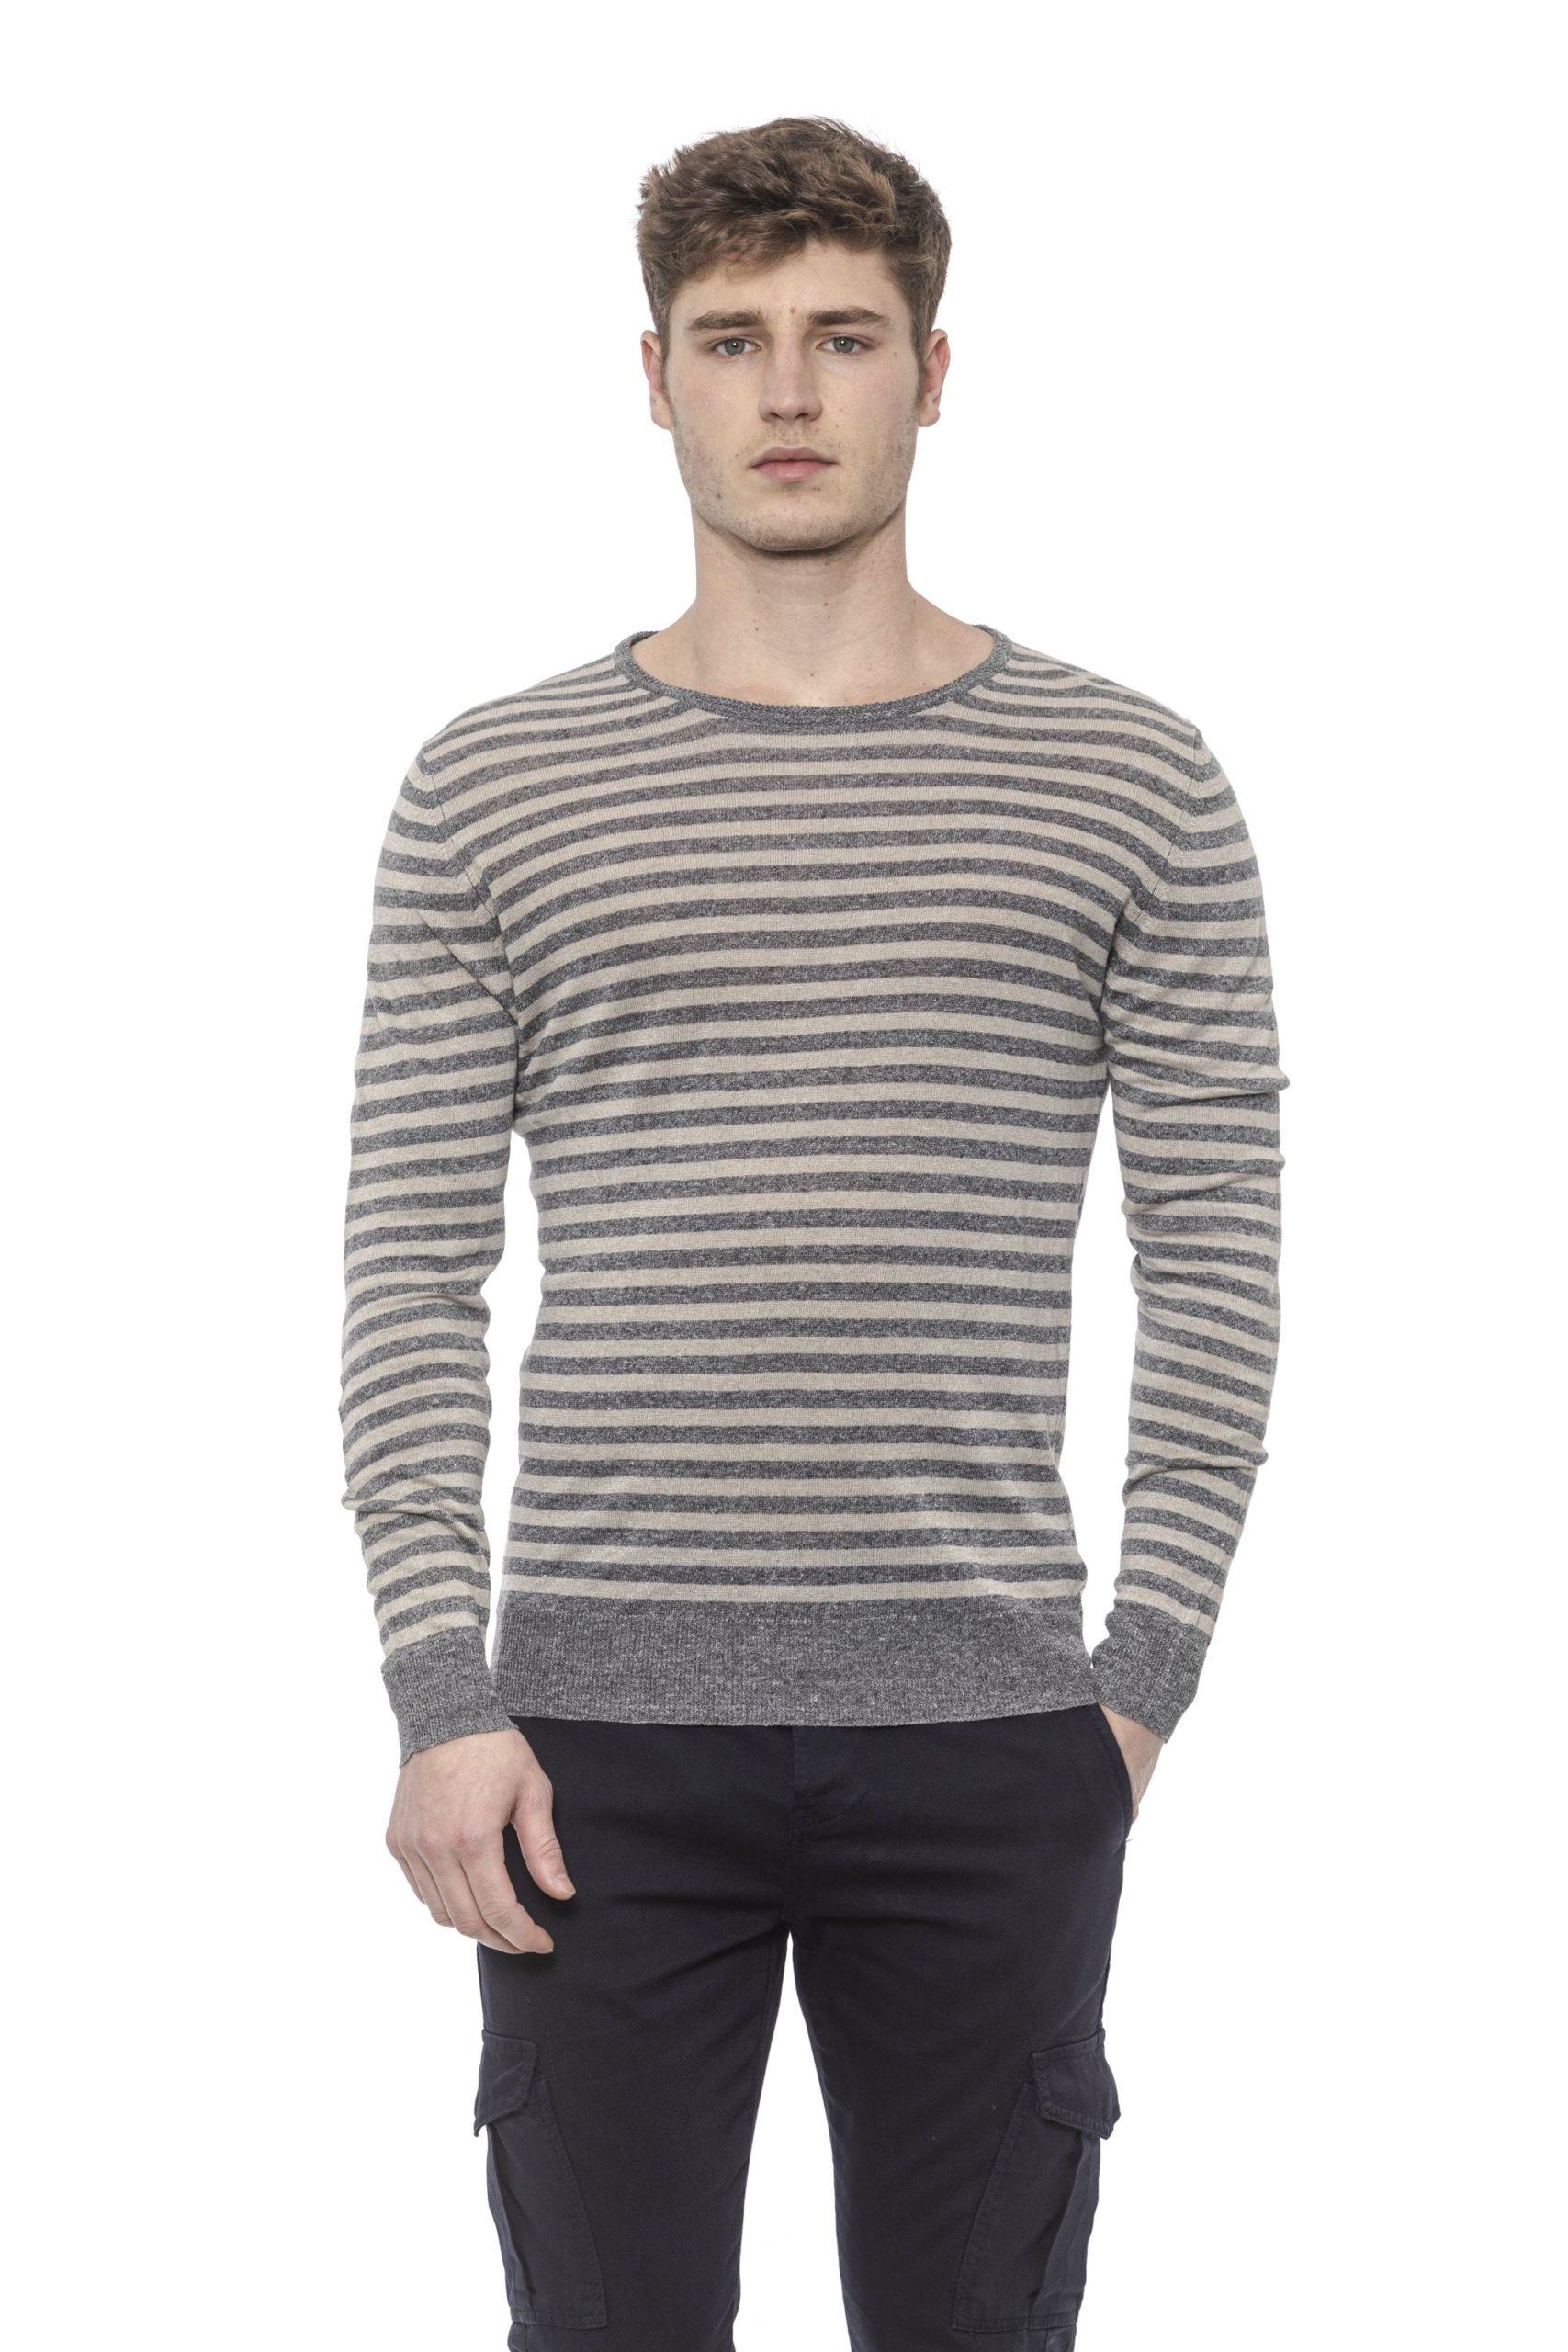 Alpha Studio Men's G R. S C U R O M E L Sweater Gray AL1374482 - IT48 | M